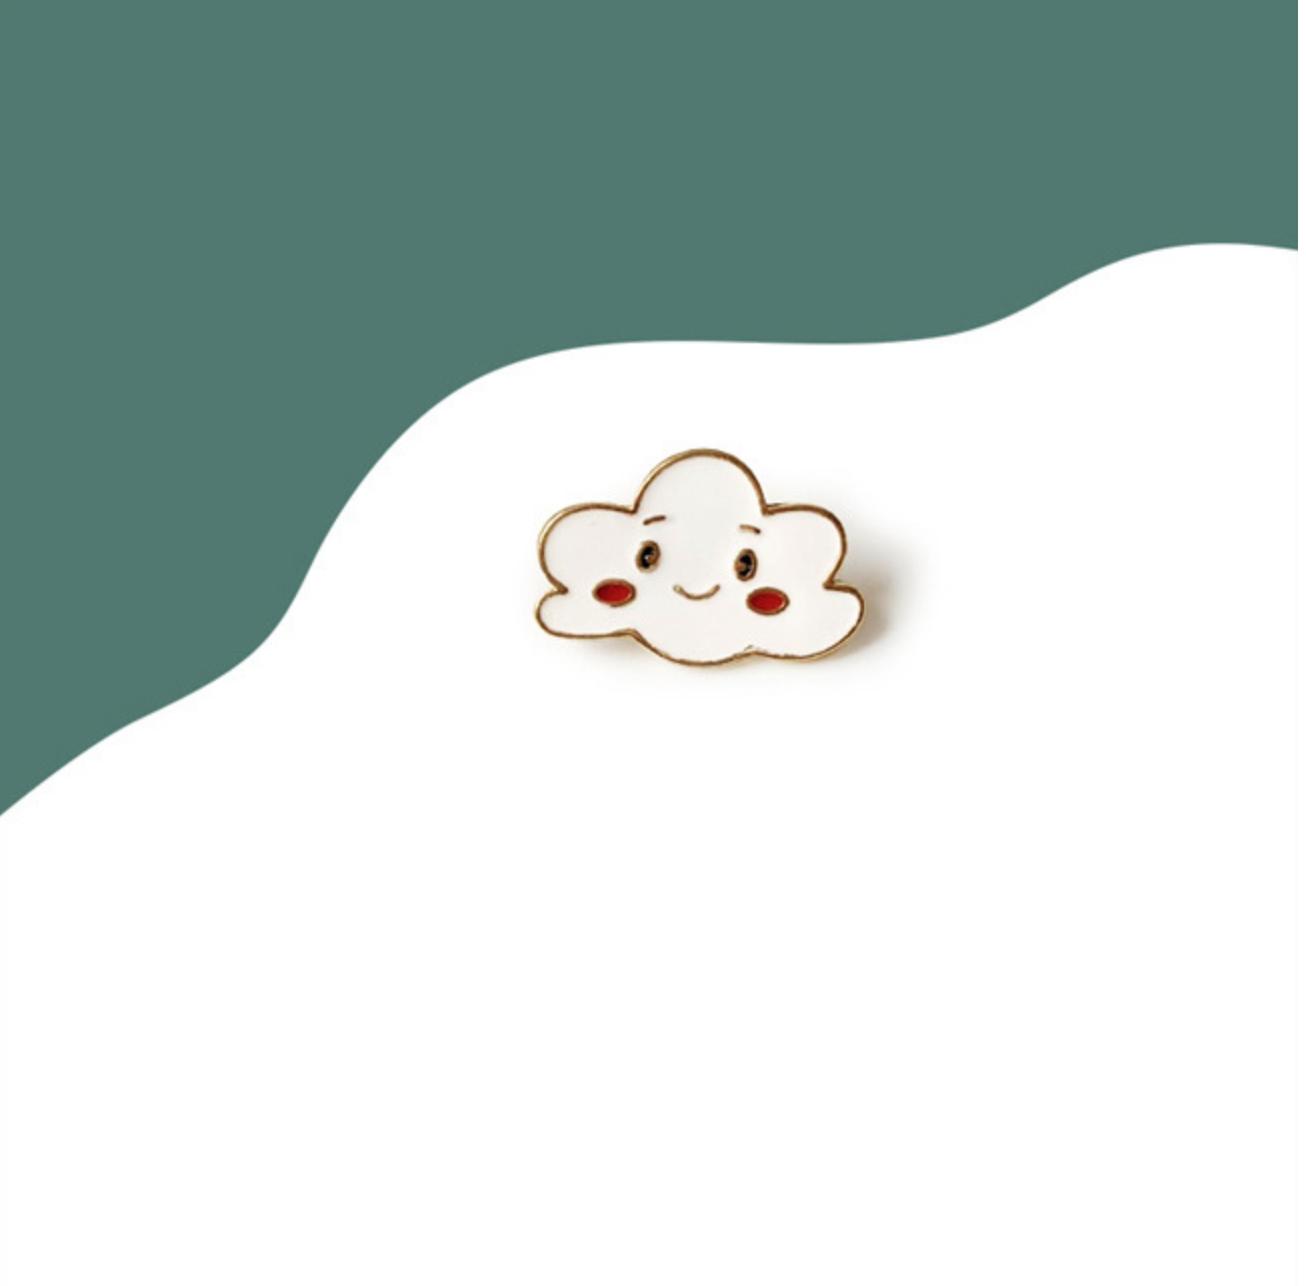 Smiley Cloud Pin